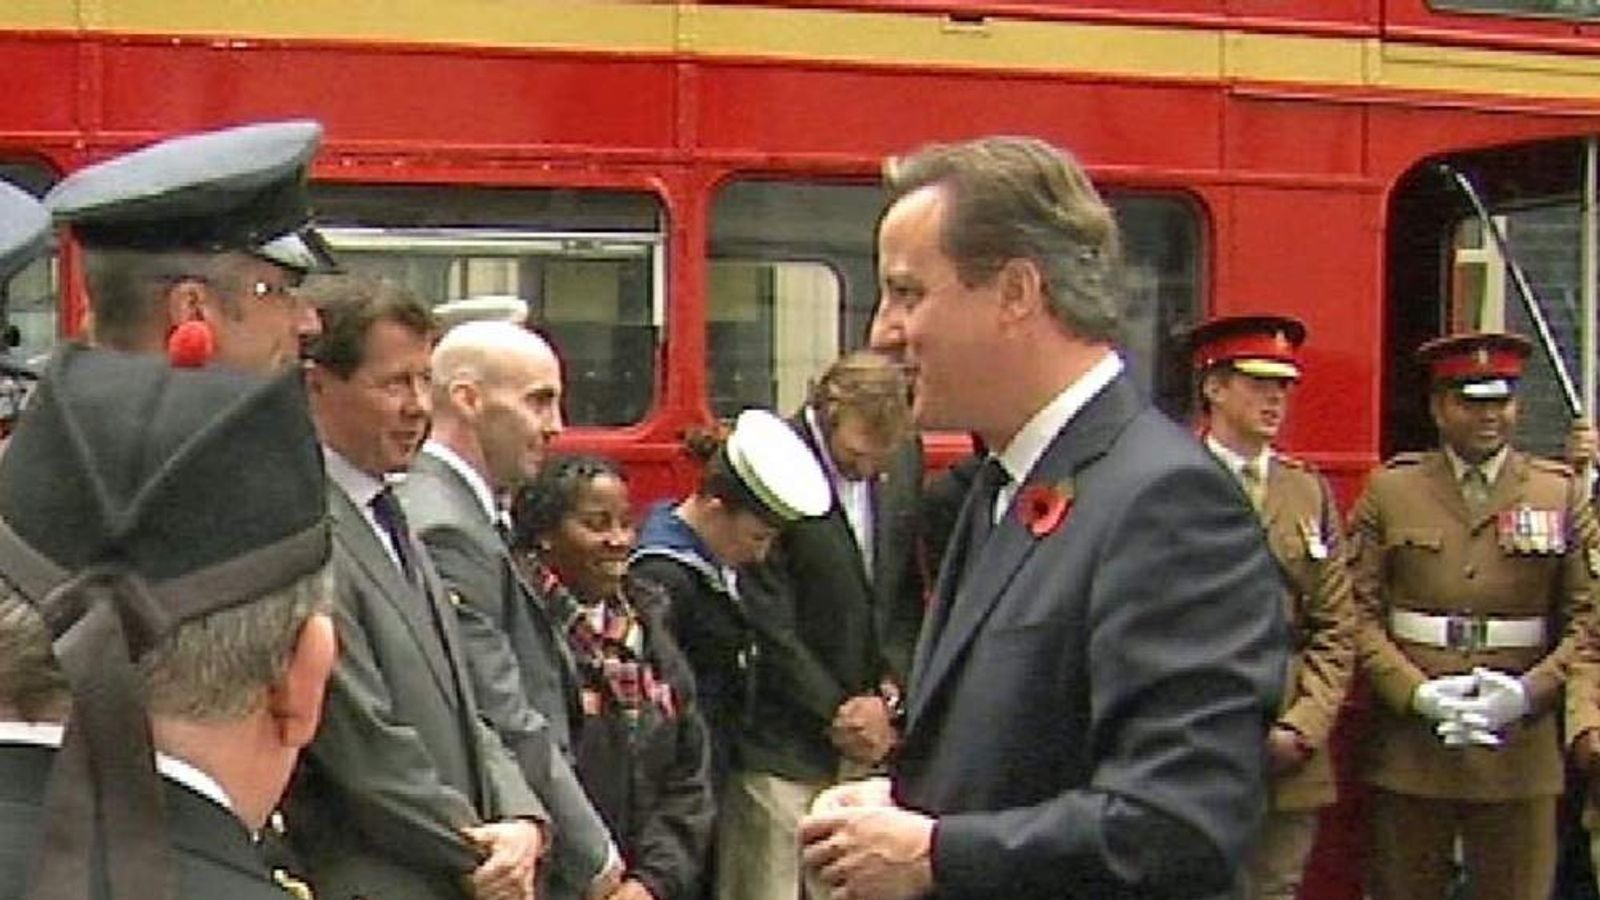 David Cameron speaks to servicemen